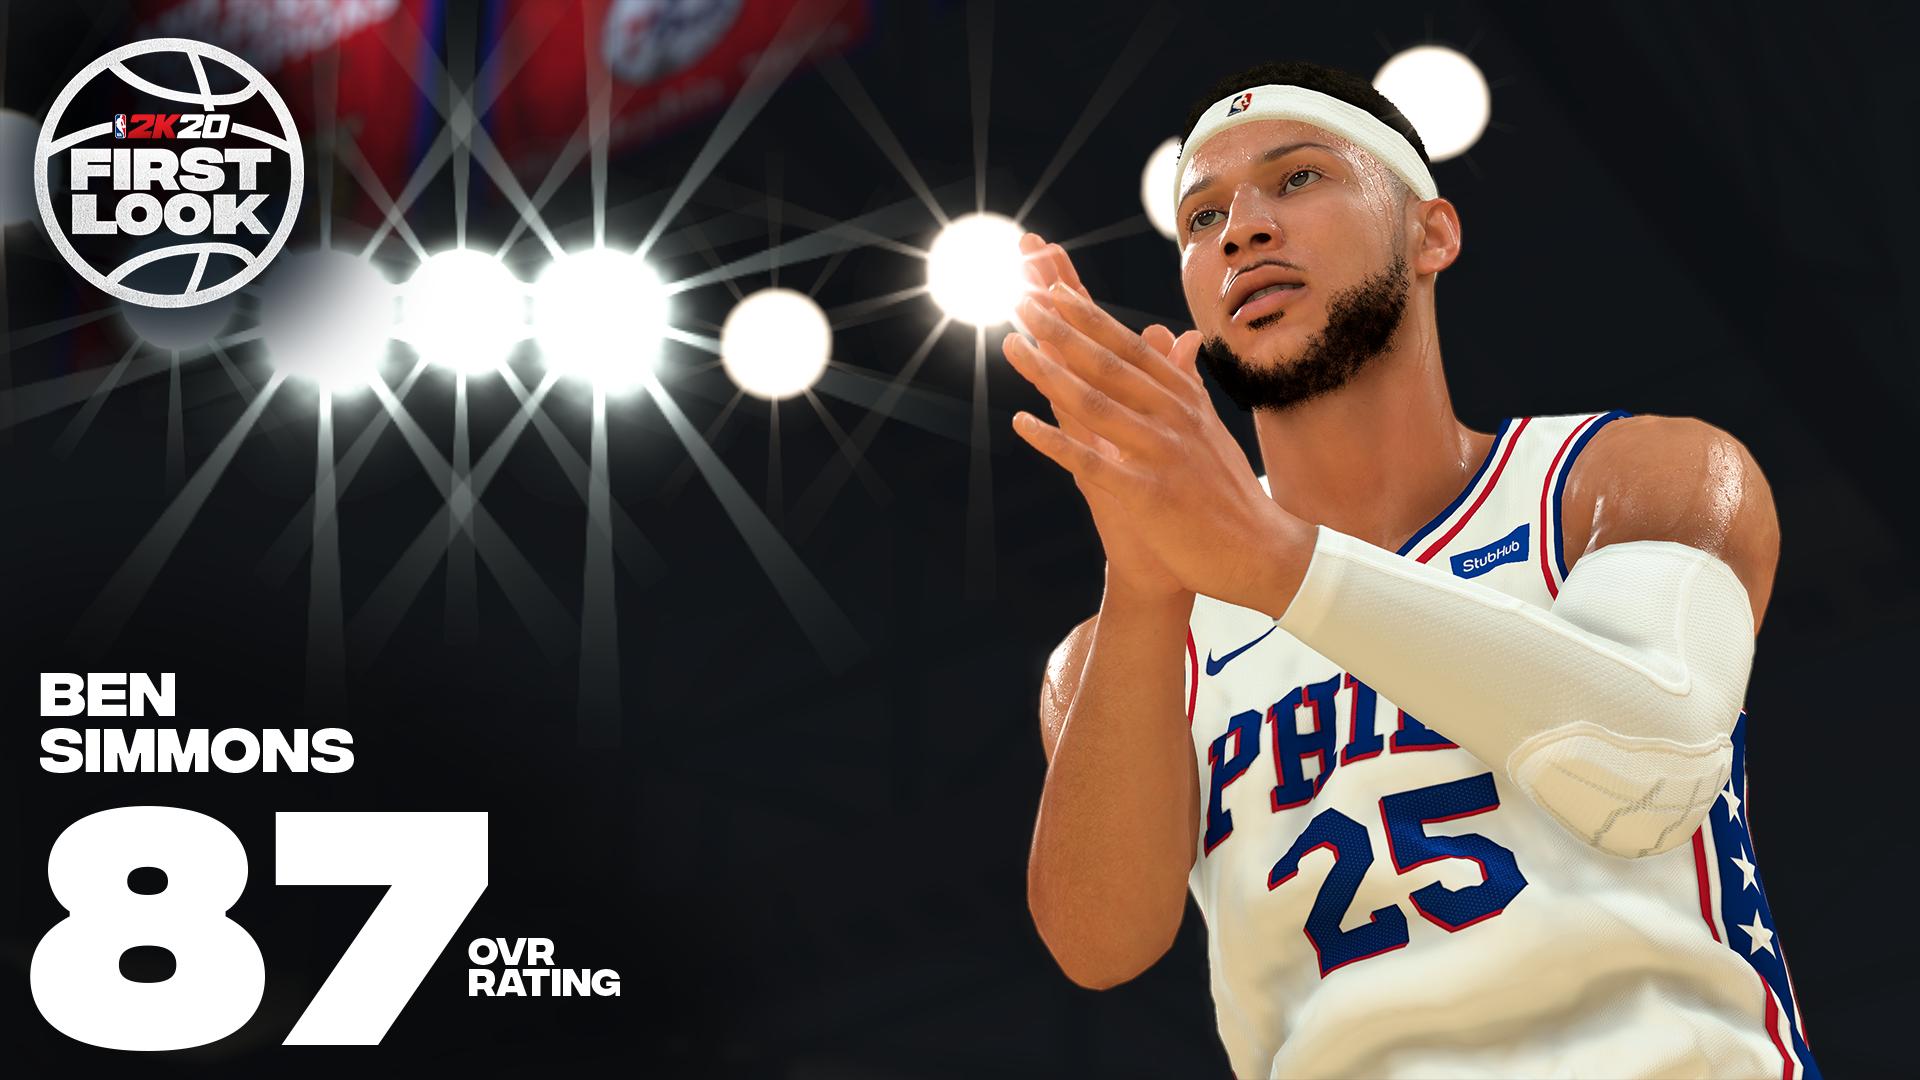 《NBA 2K20》明星球员评分公布!老詹连续10年评分最高 第21张